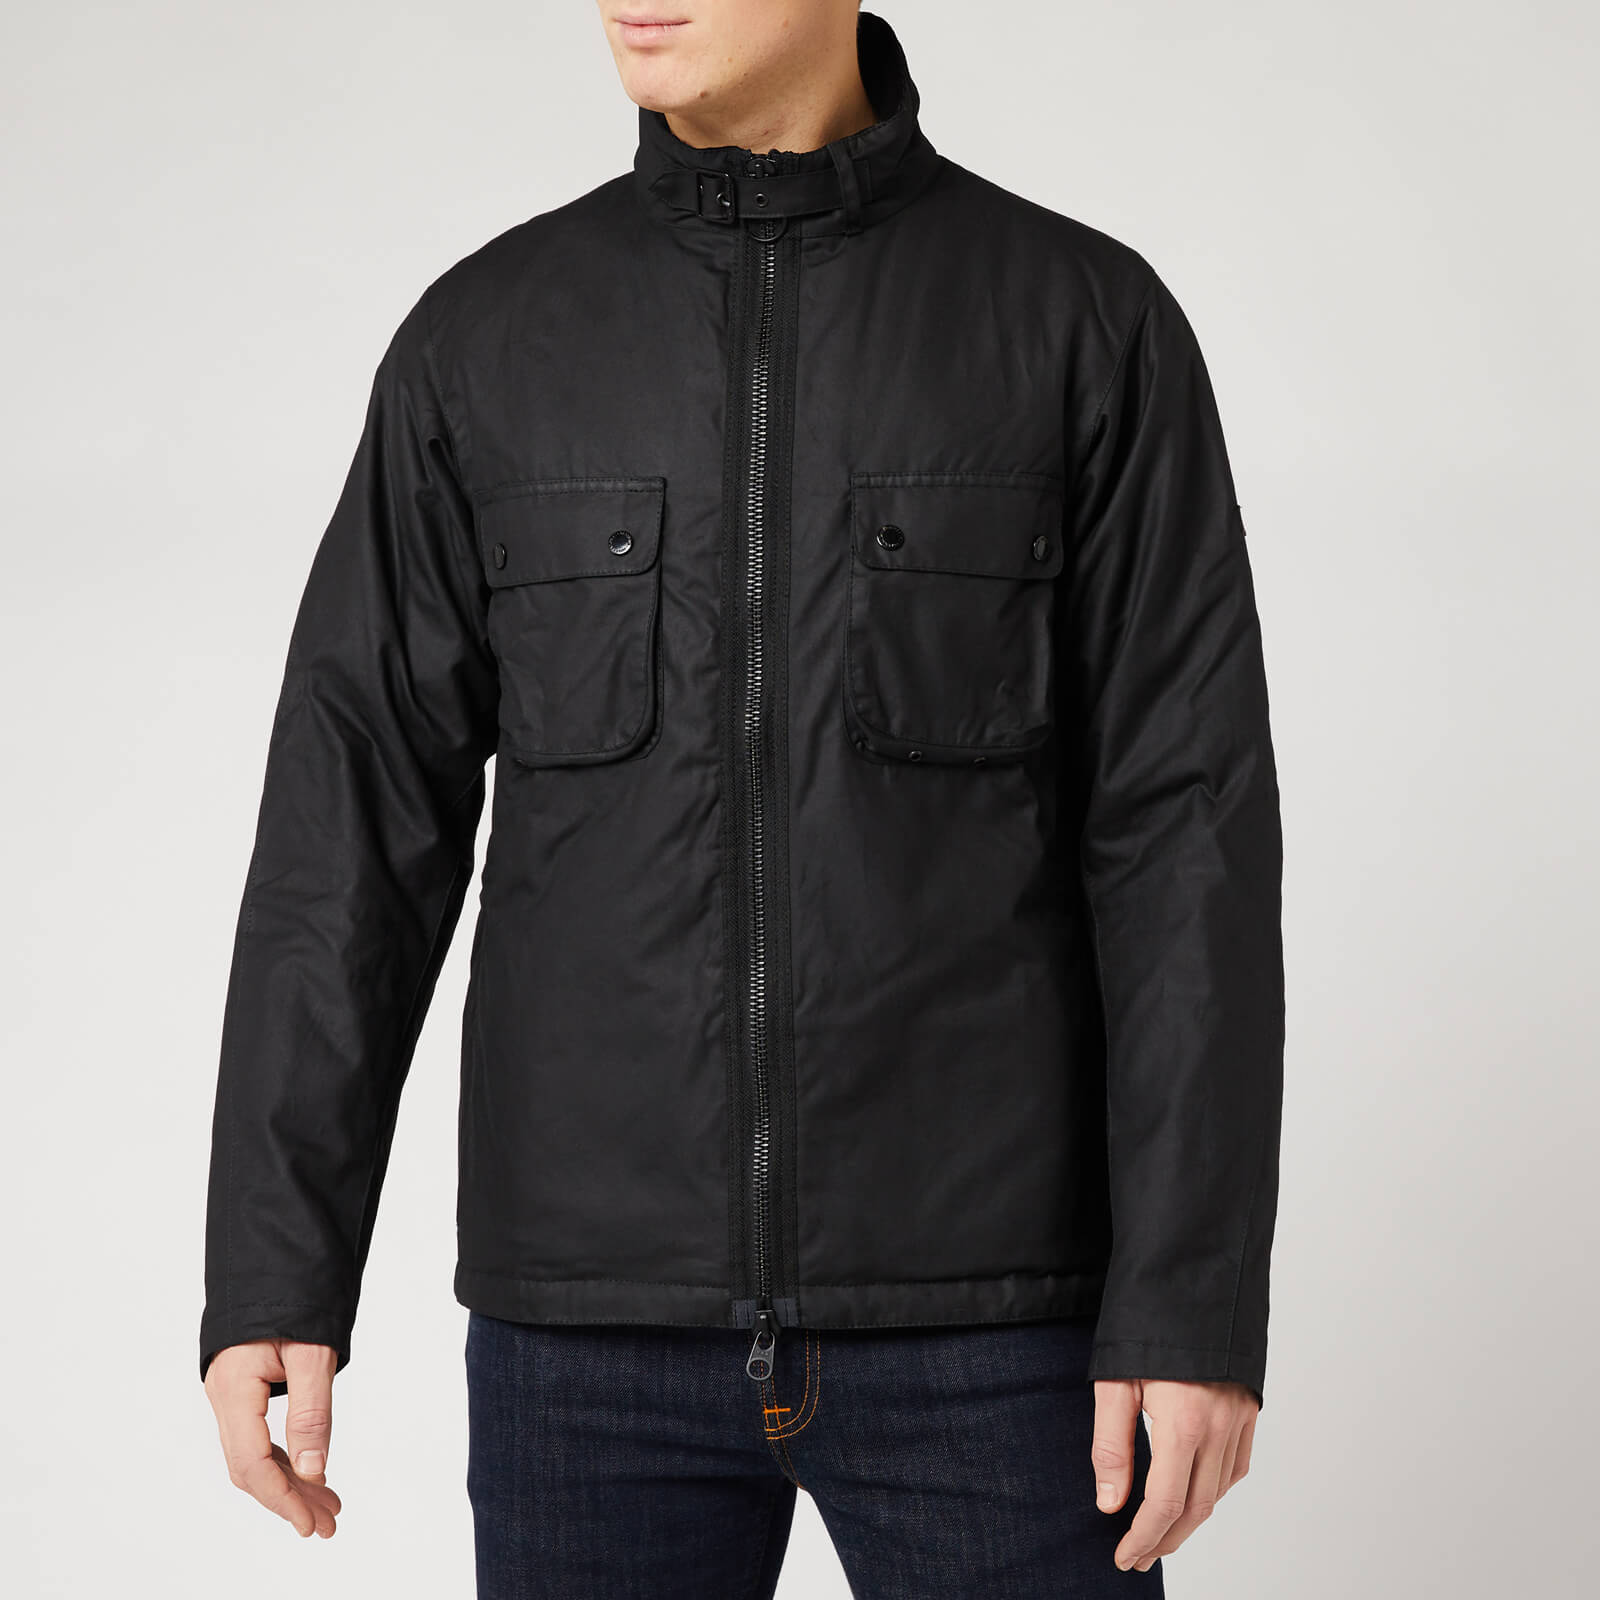 Barbour International Men's Tennant Wax Jacket - Black - S